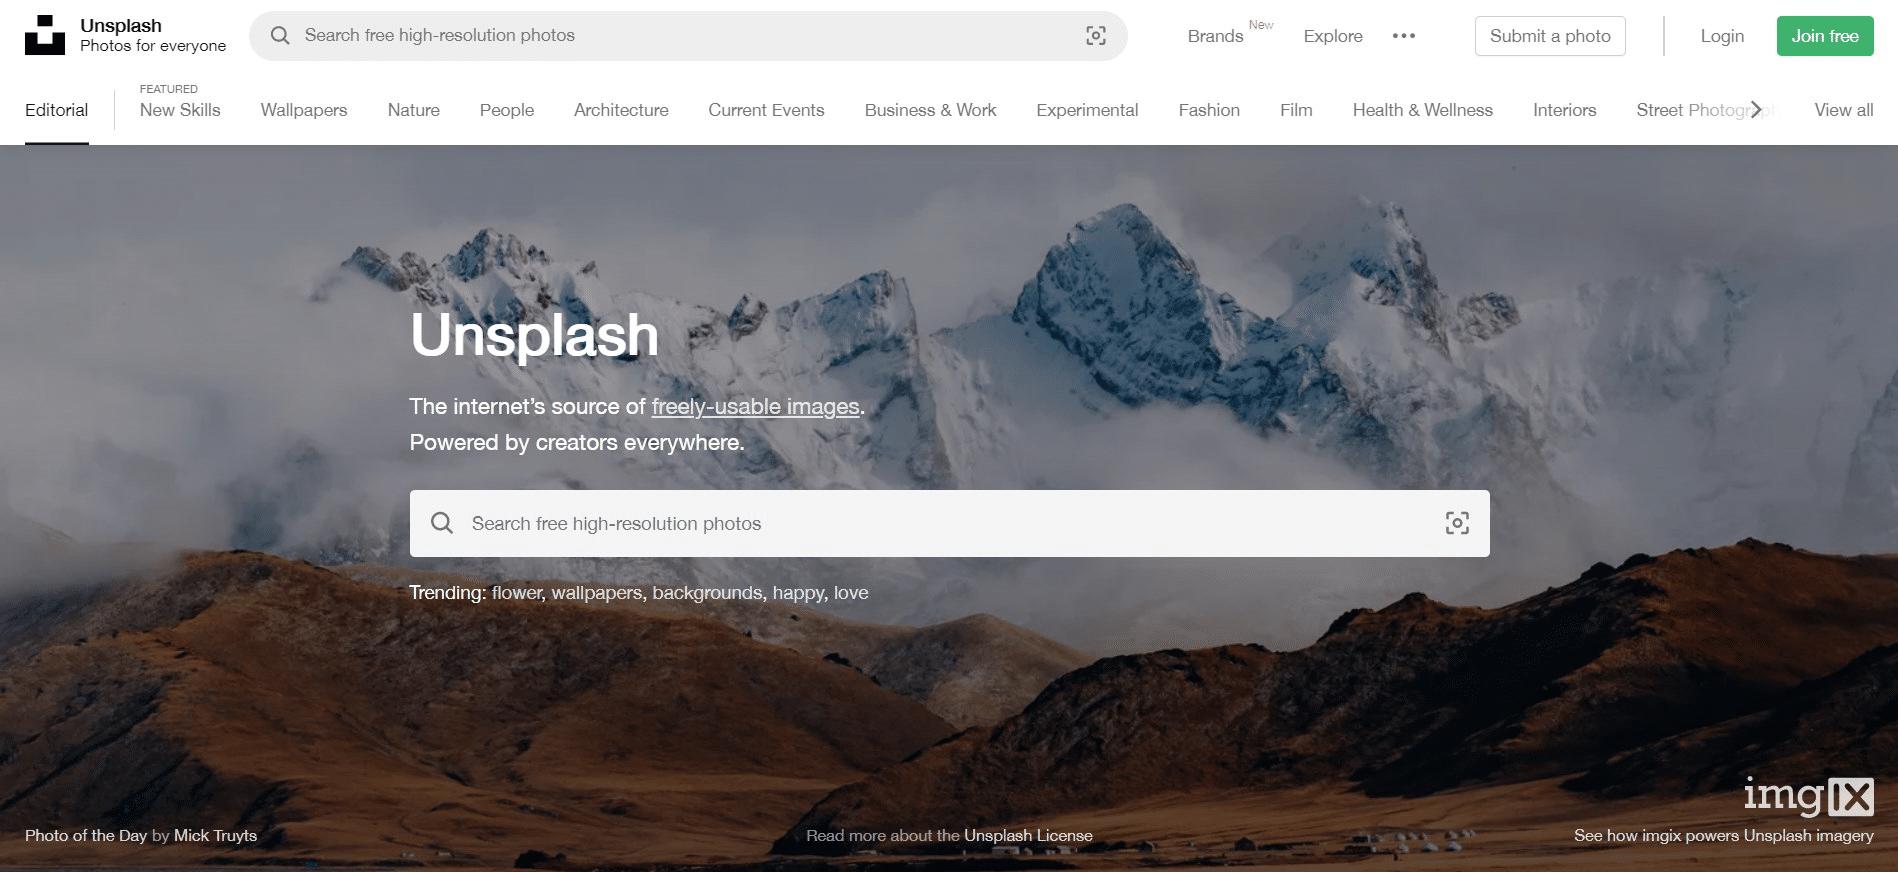 Unsplash free stock image - bigwigblogger